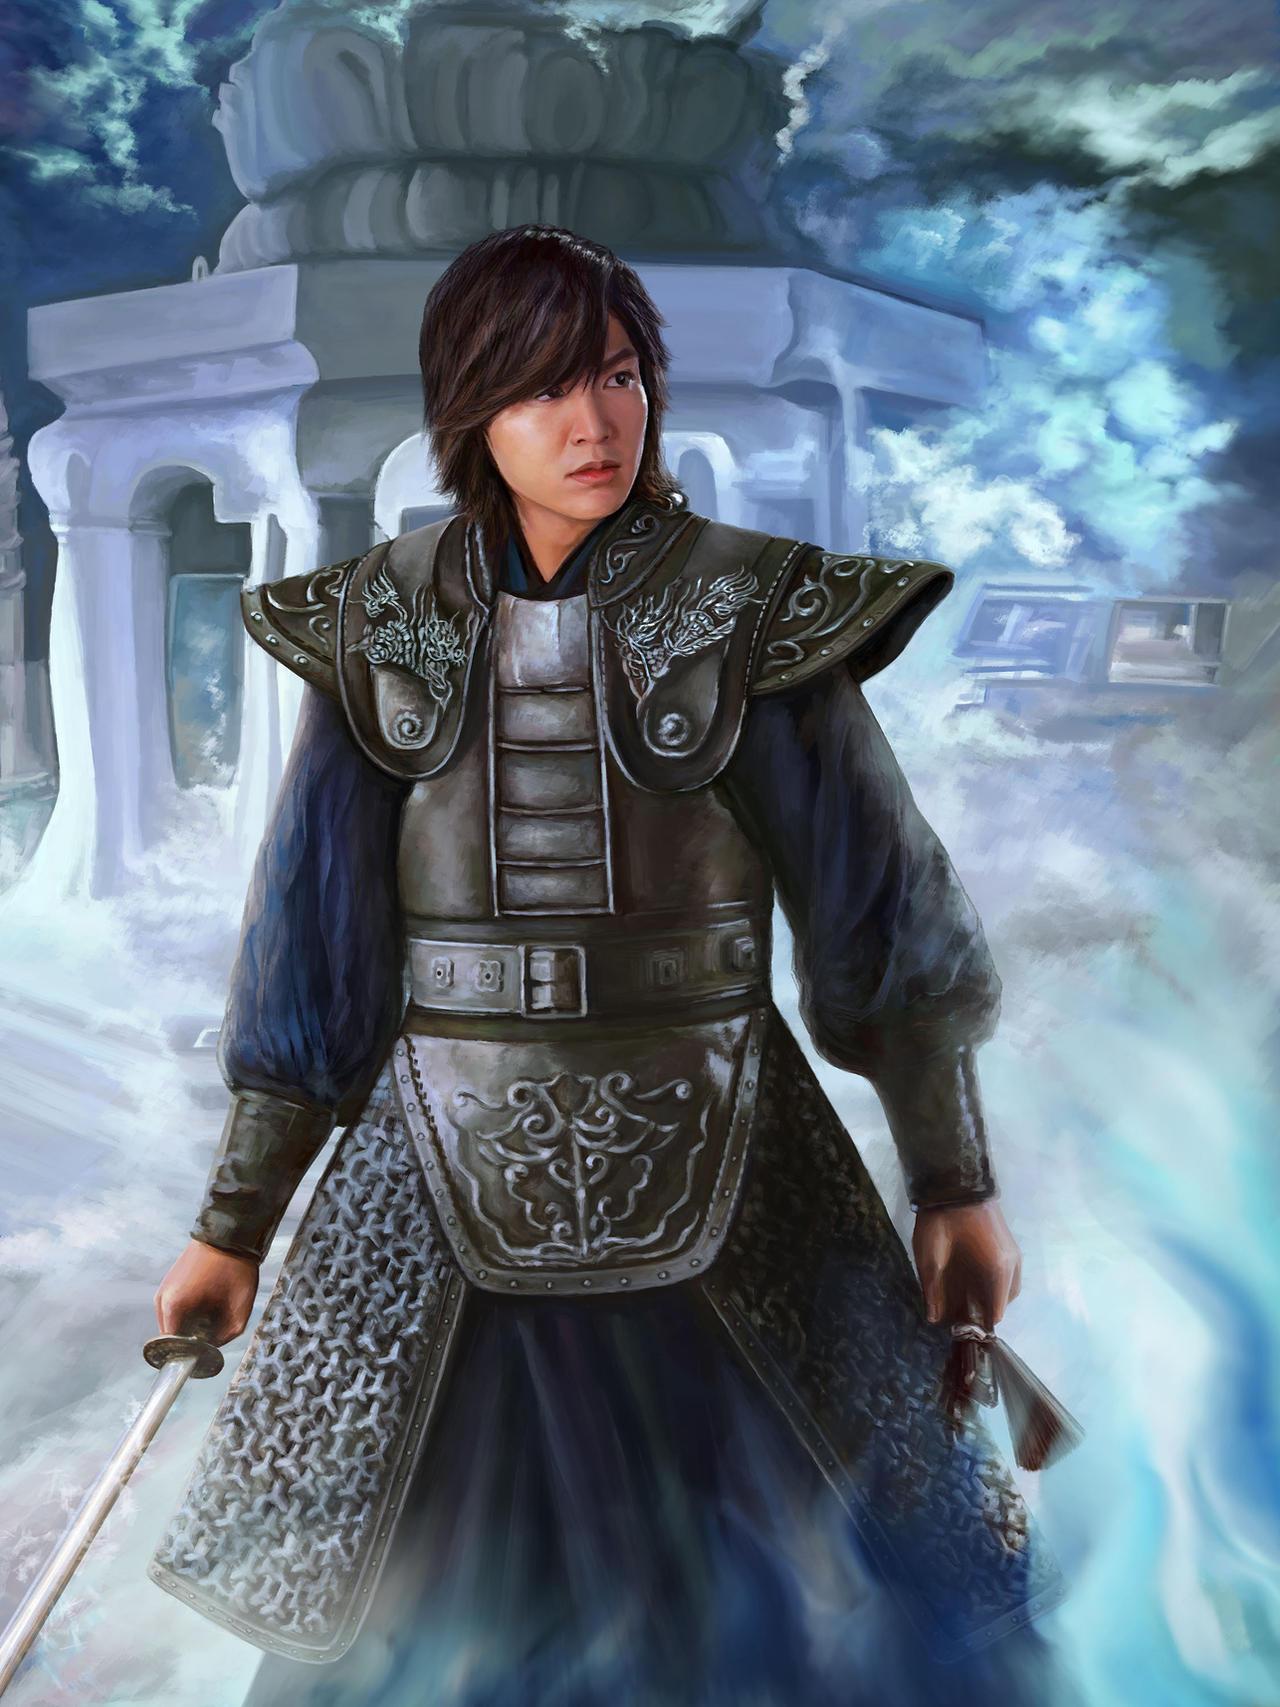 Choi Young: Faith by Vilenchik on DeviantArt